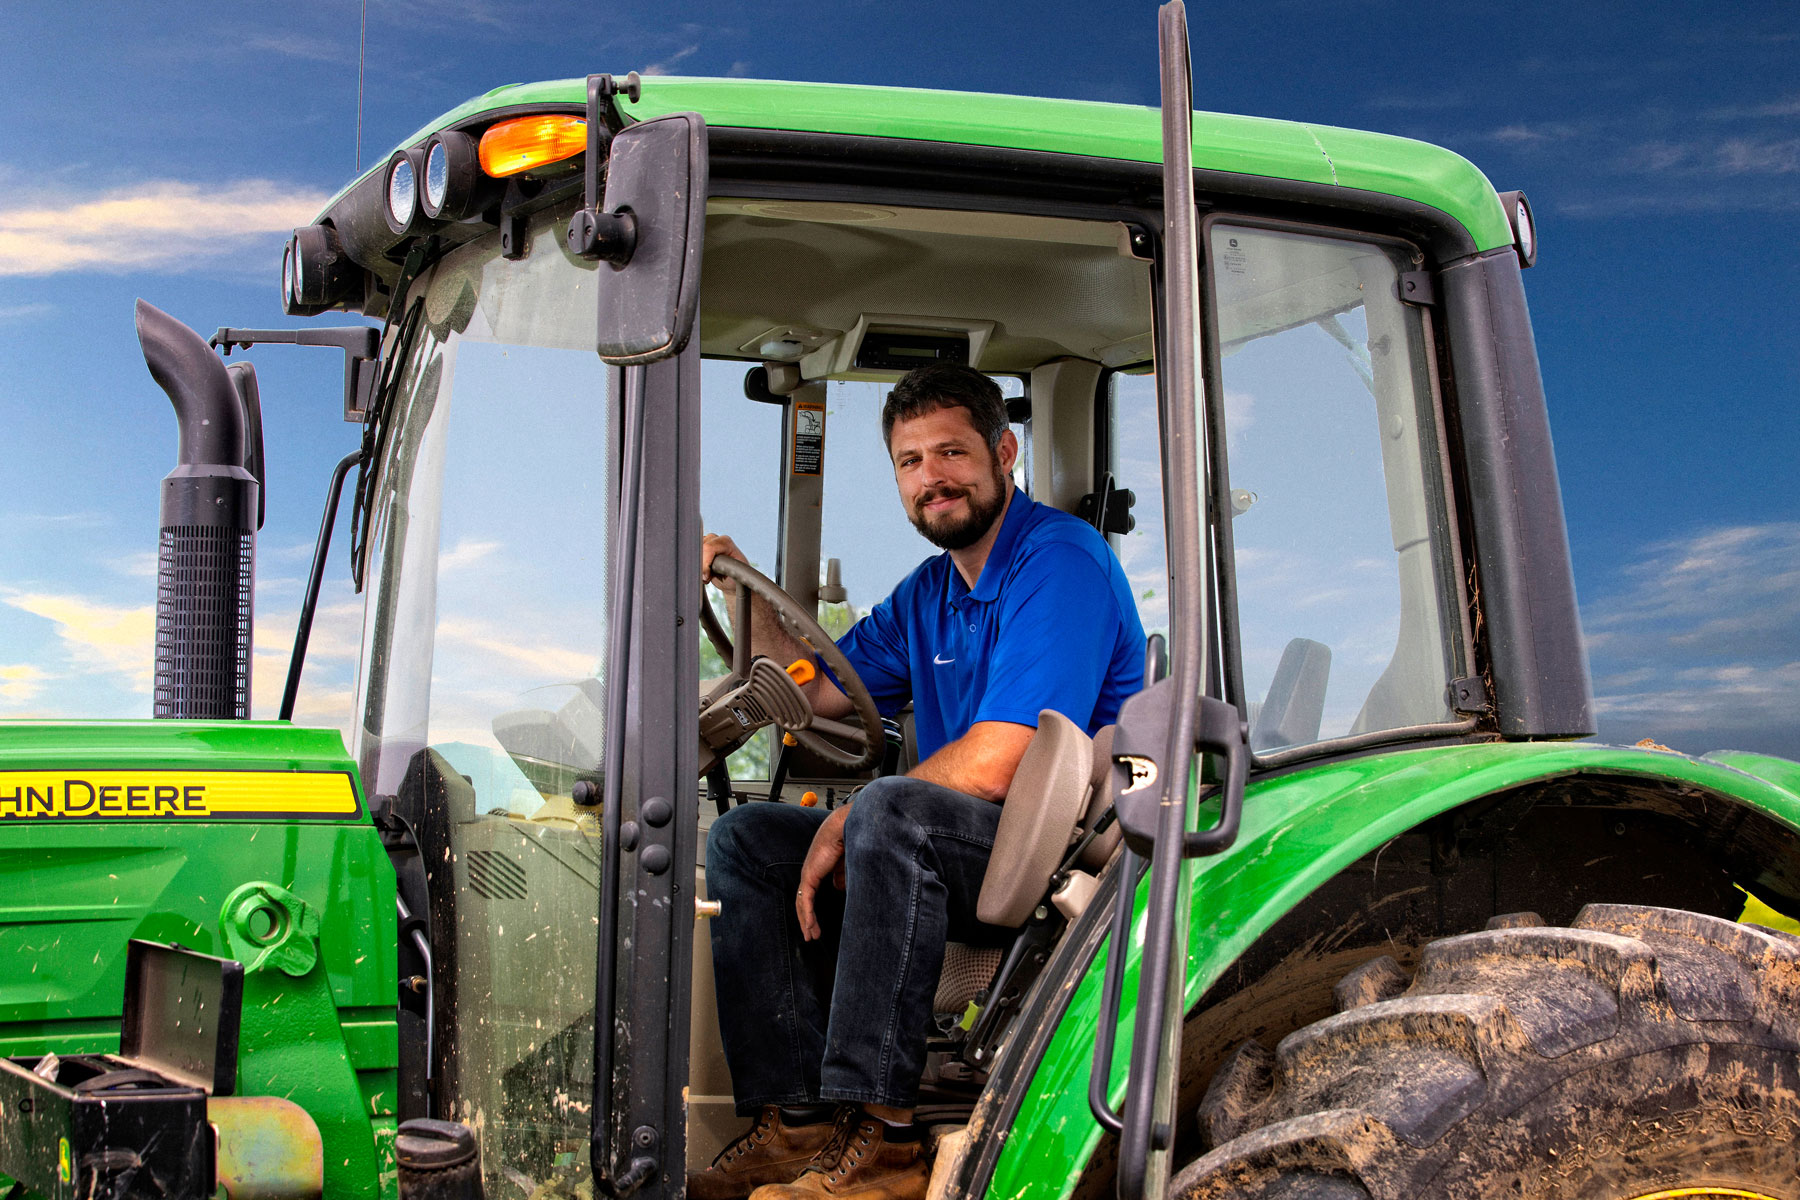 Jacob drives his John Deere tractor.